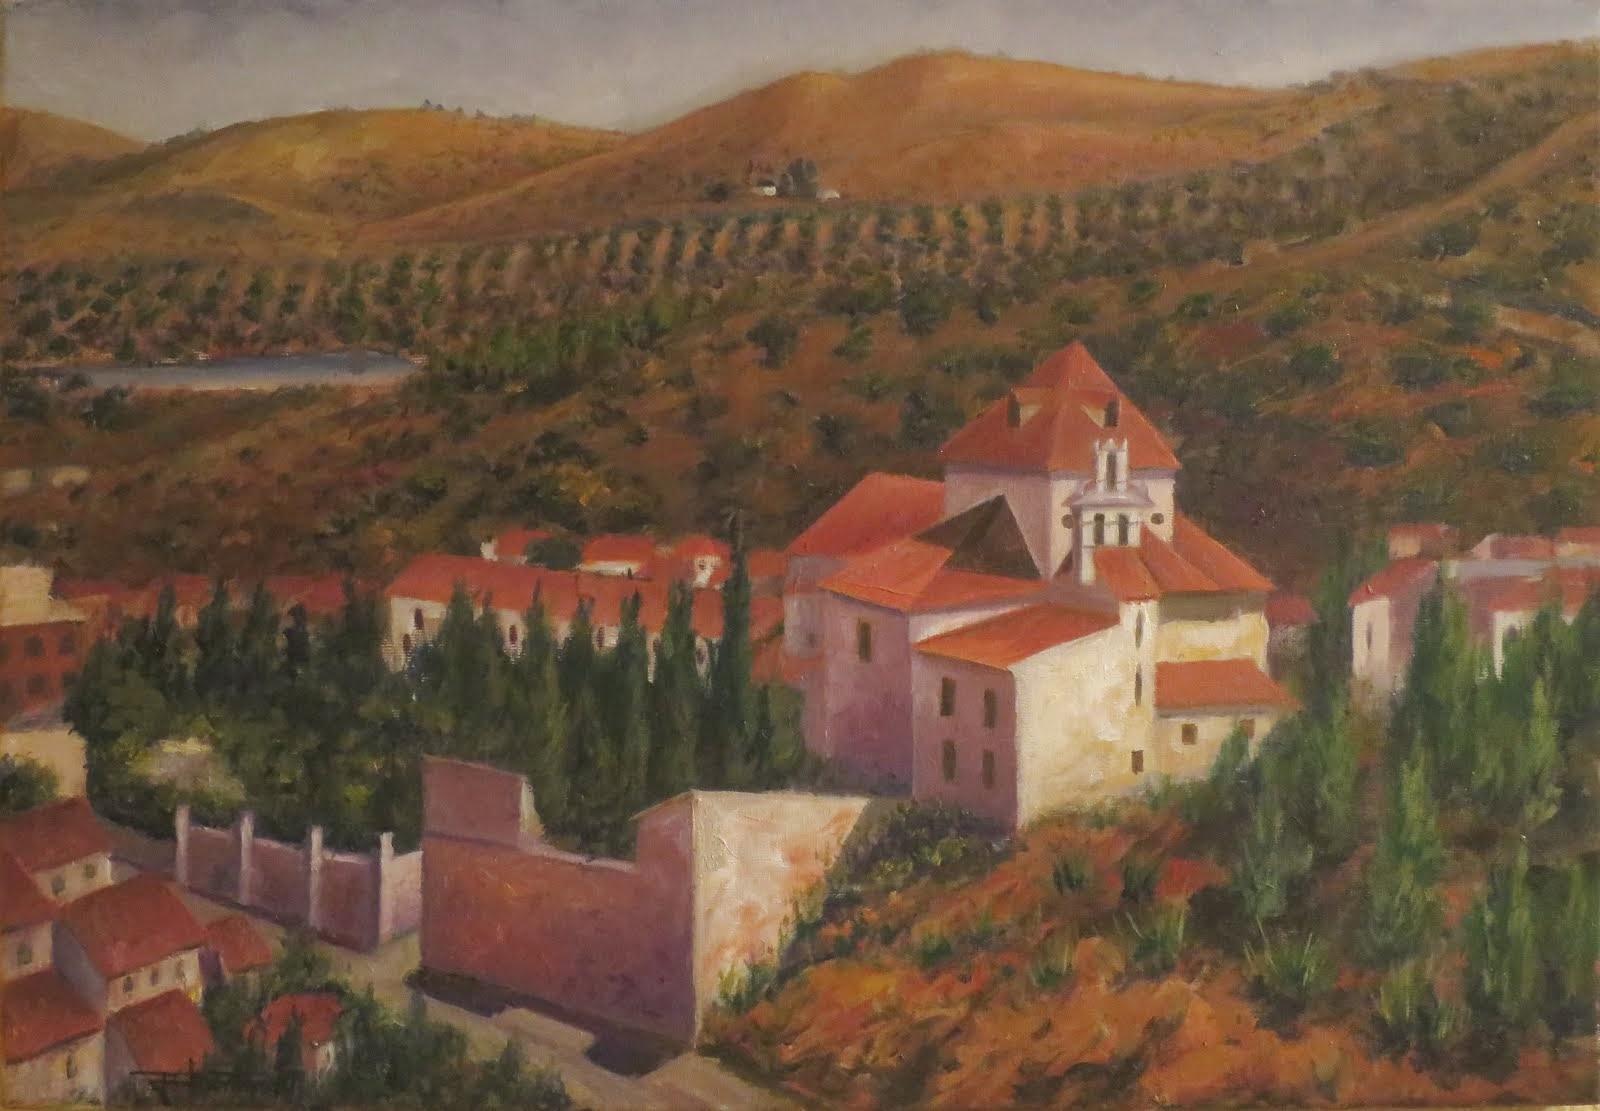 La iglesia de Macharaviaya, Málaga. (10P)